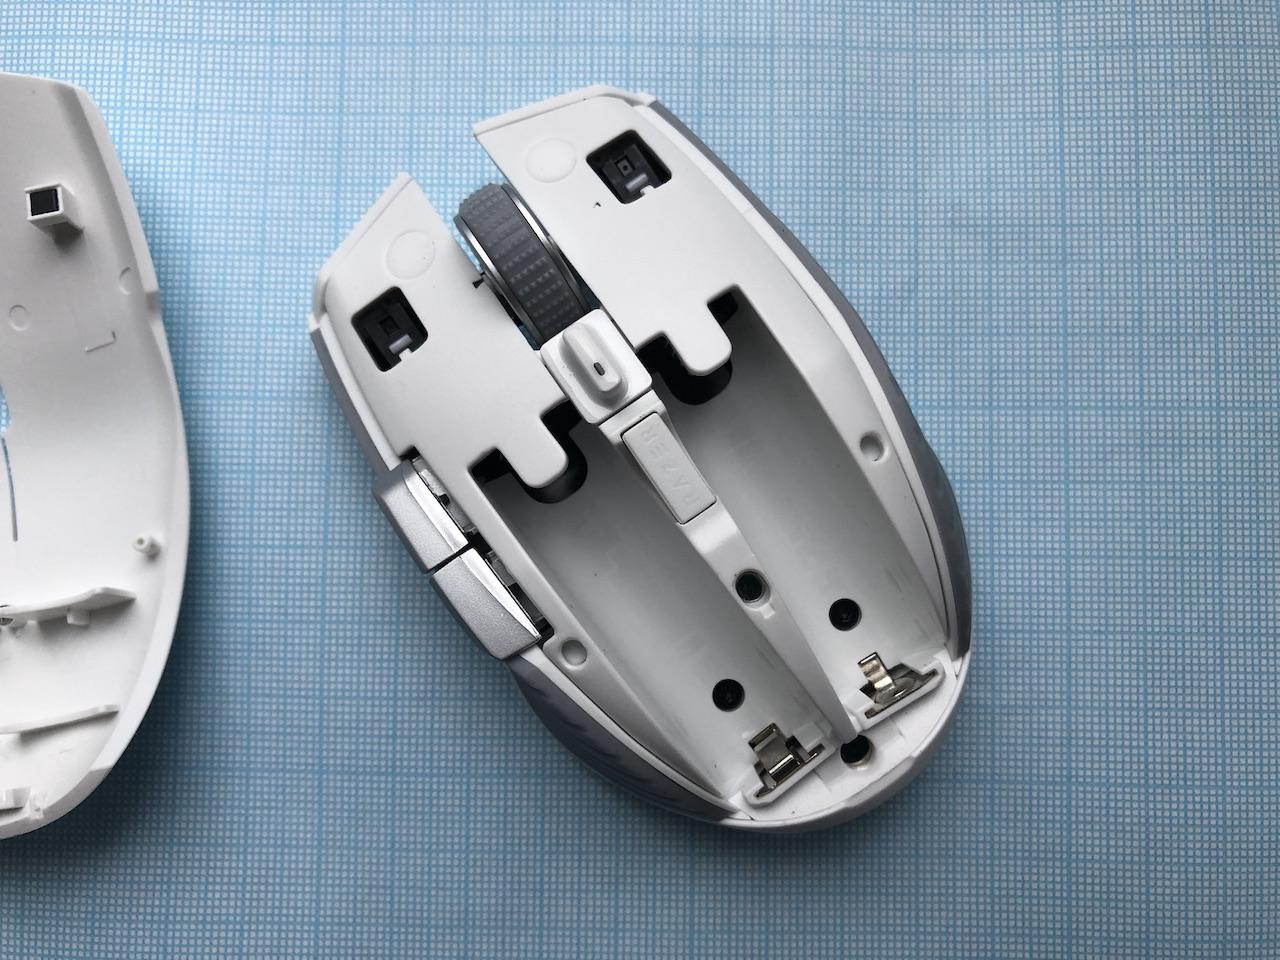 Обзор беспроводной мыши Razer Atheris Mercury White